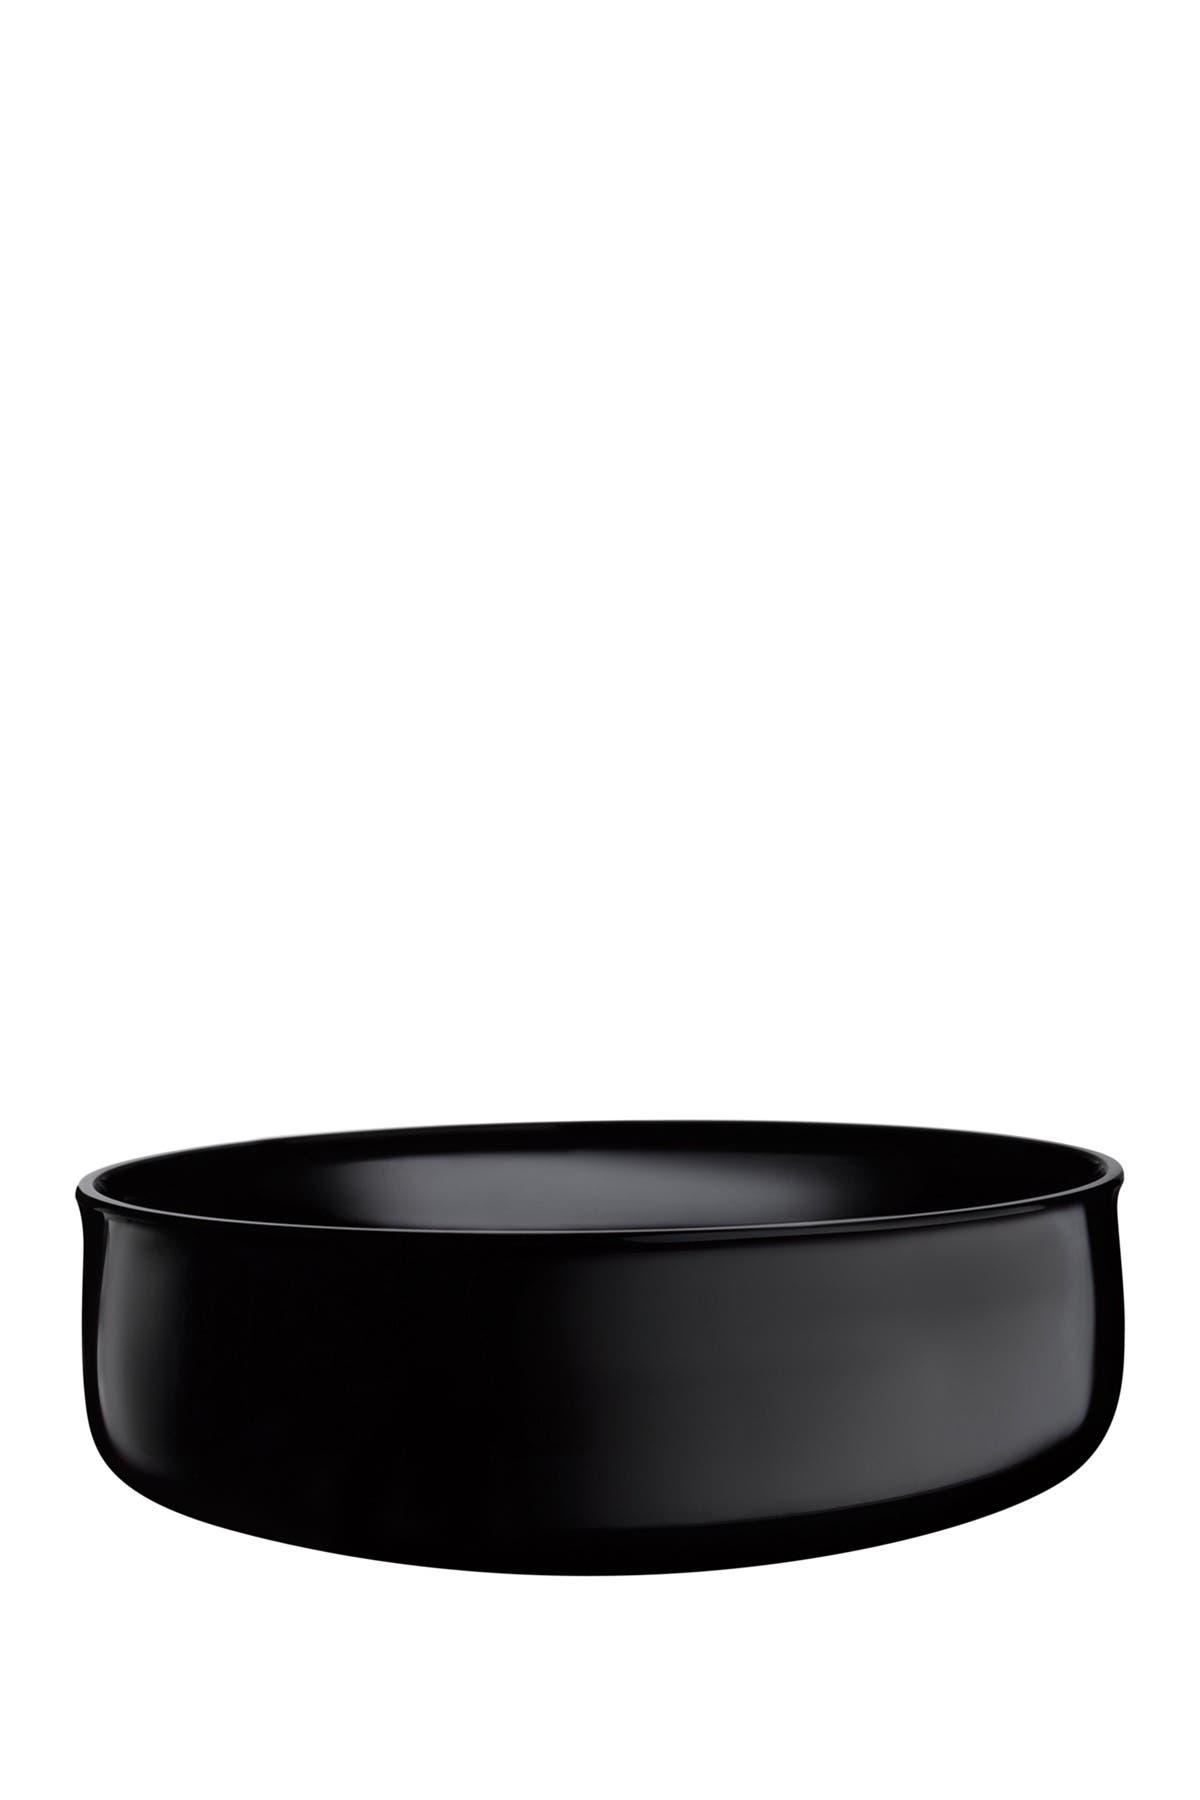 Image of Nude Glass Midnight Bowl - Medium - Black